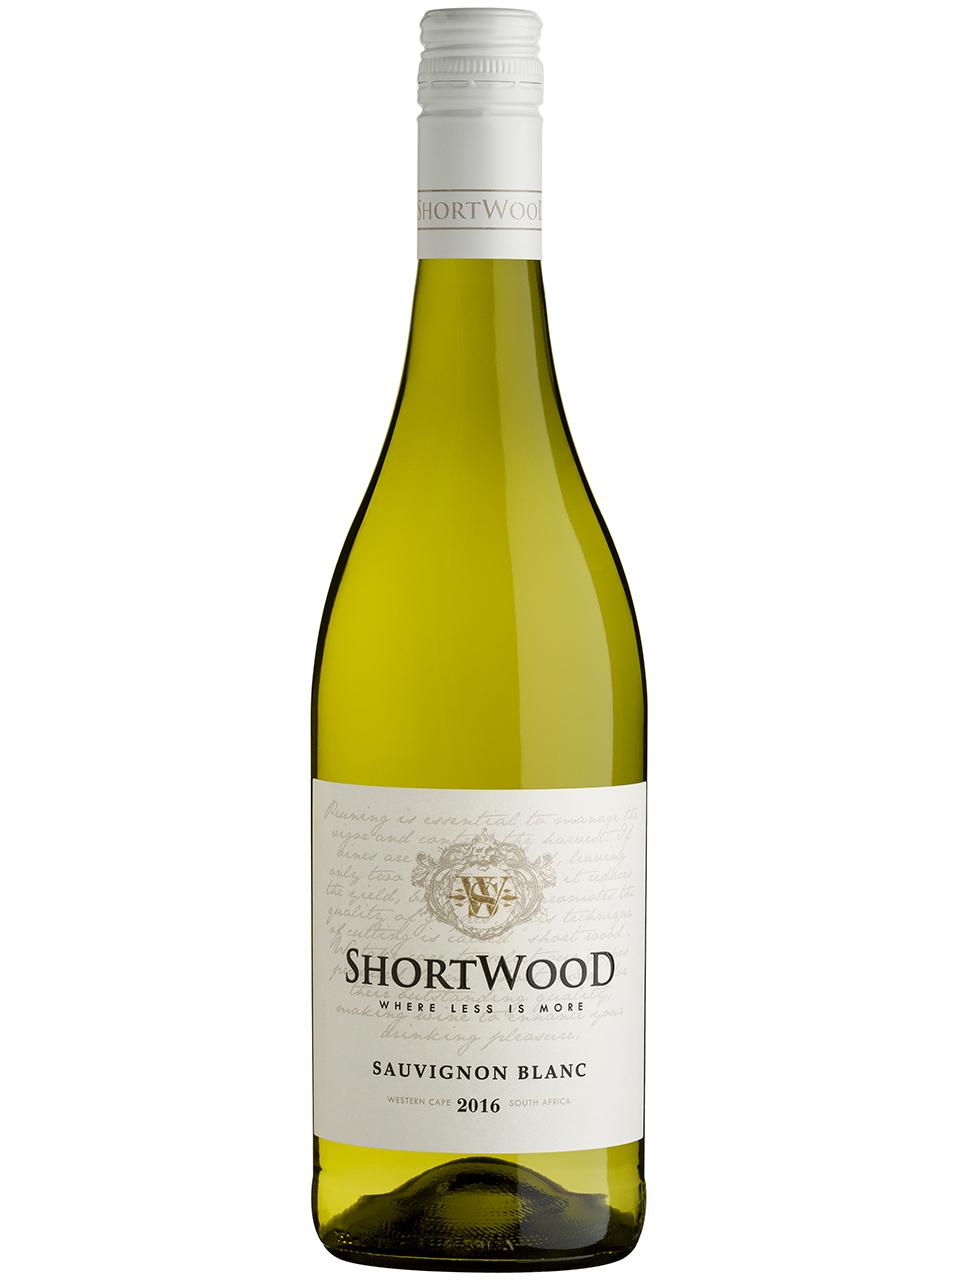 Shortwood Sauvignon Blanc